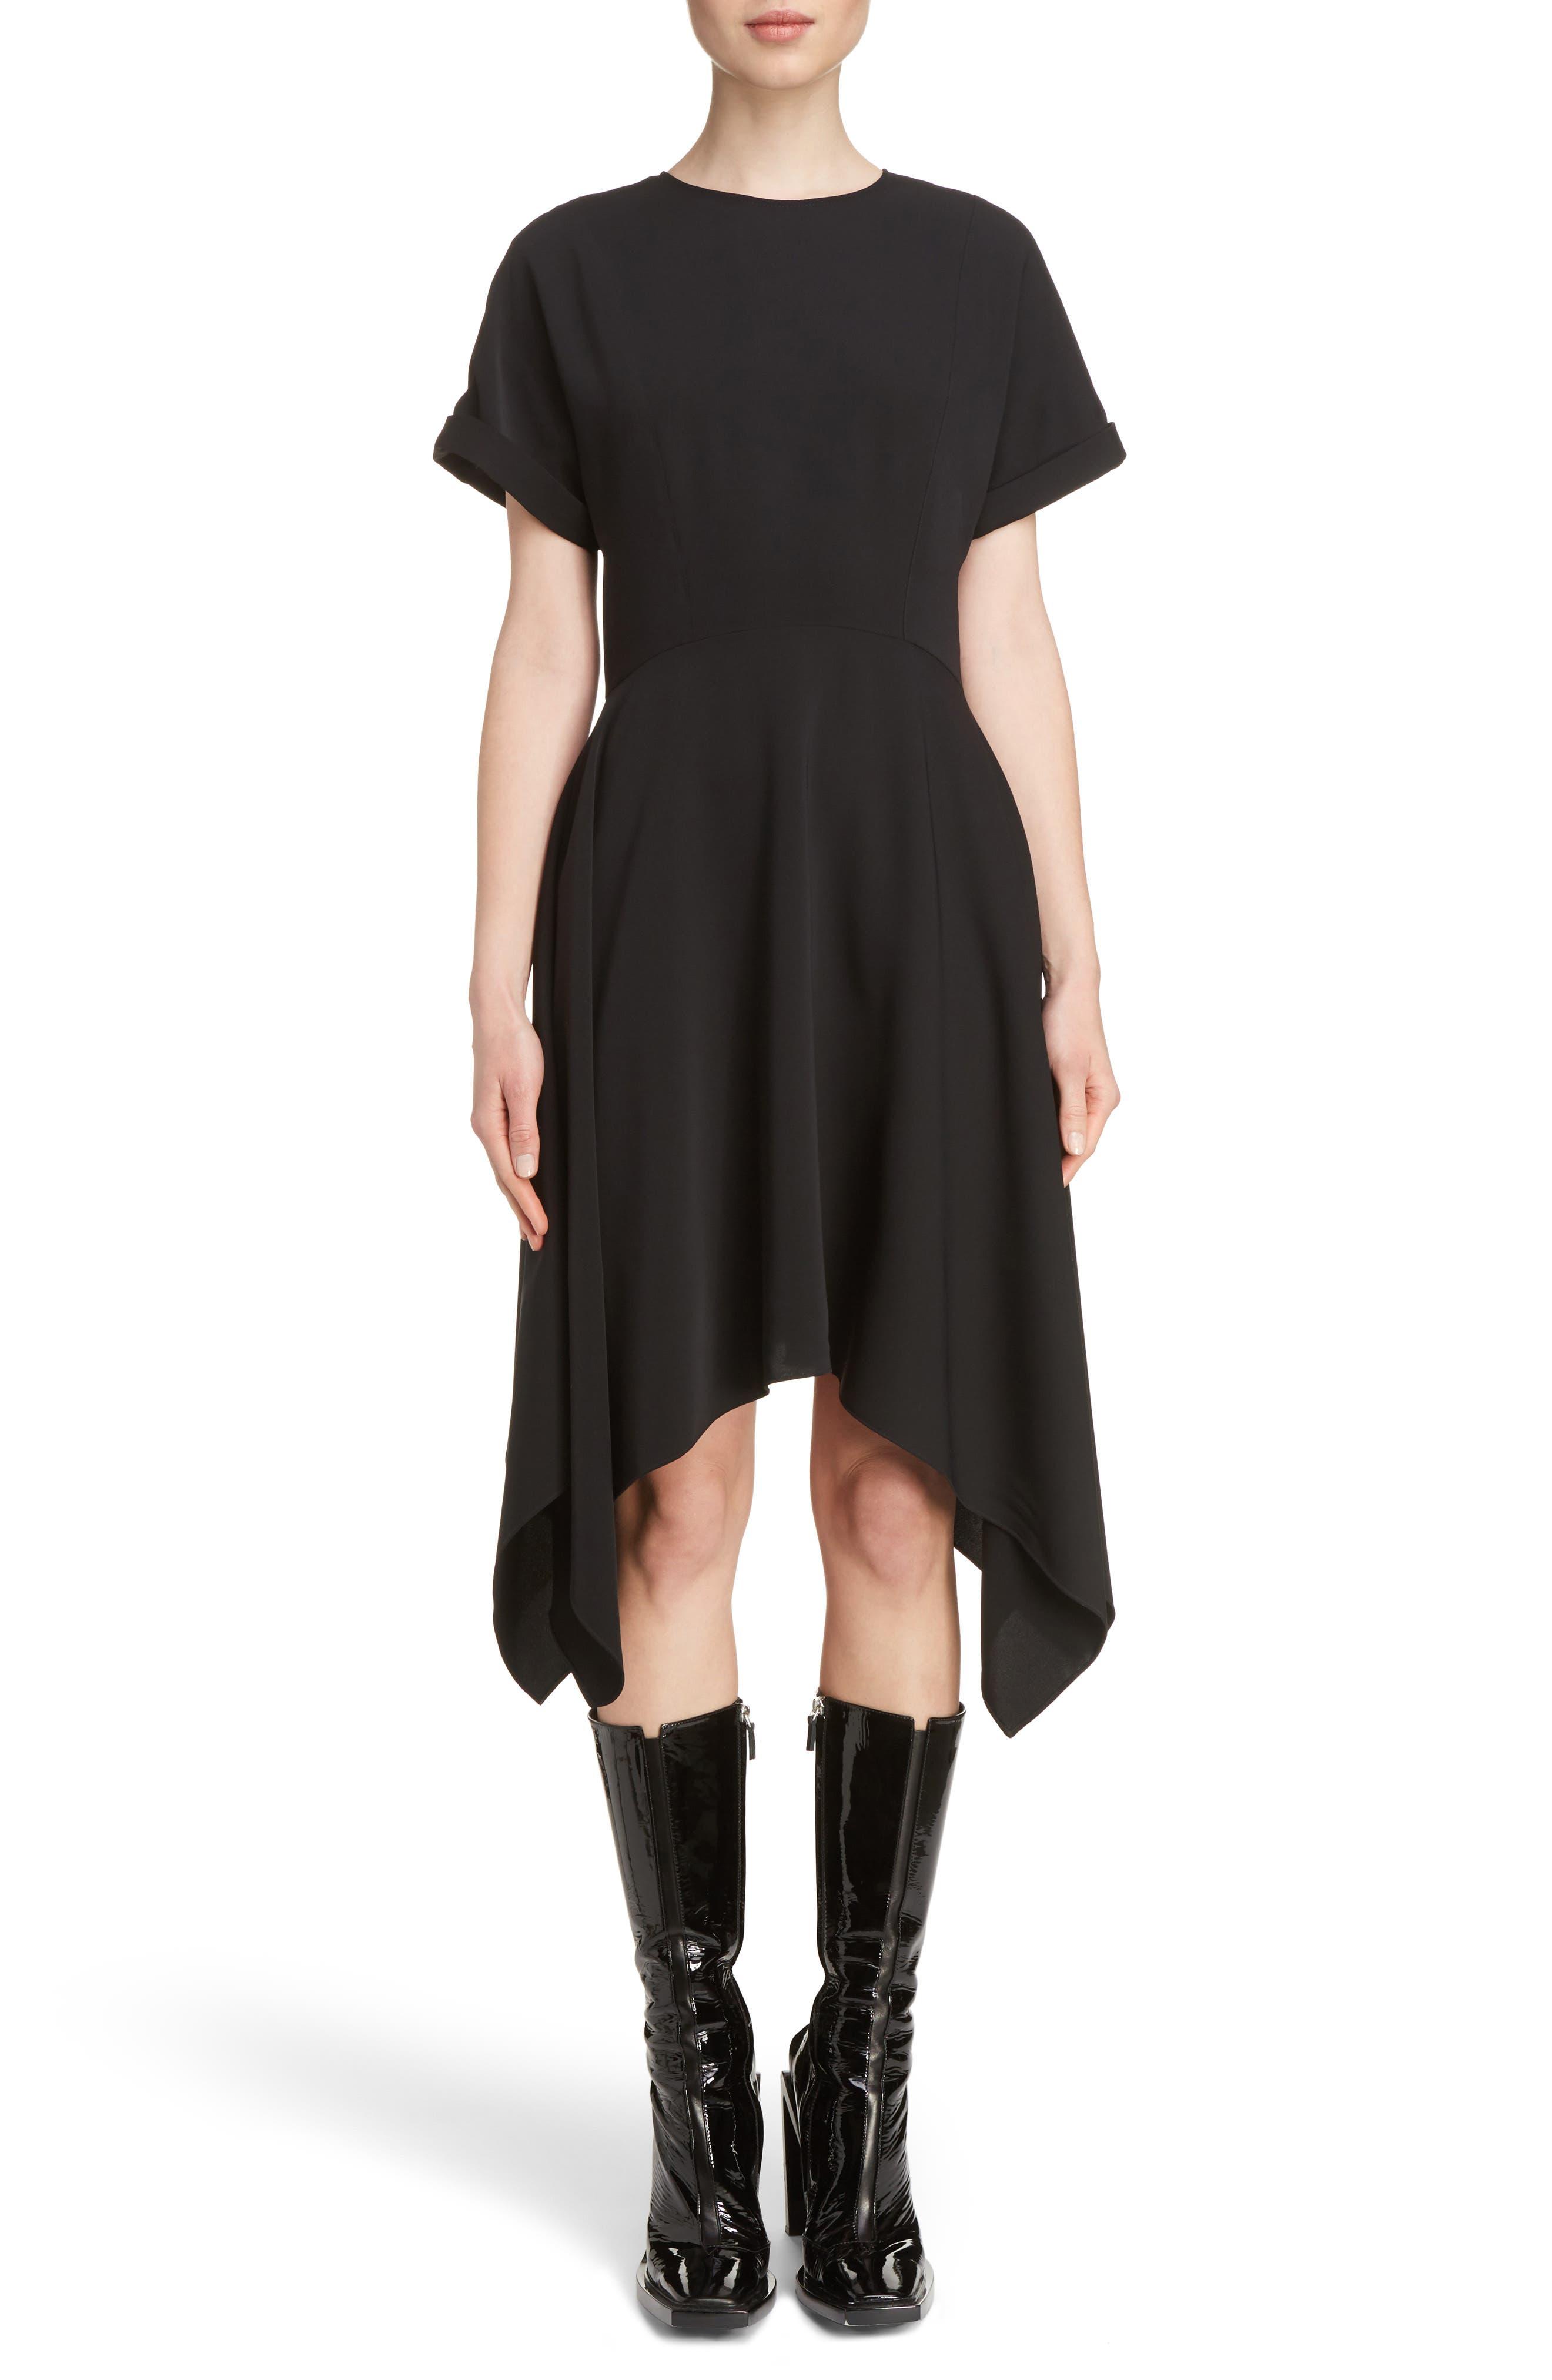 KENZO Shark Bite Flare Dress